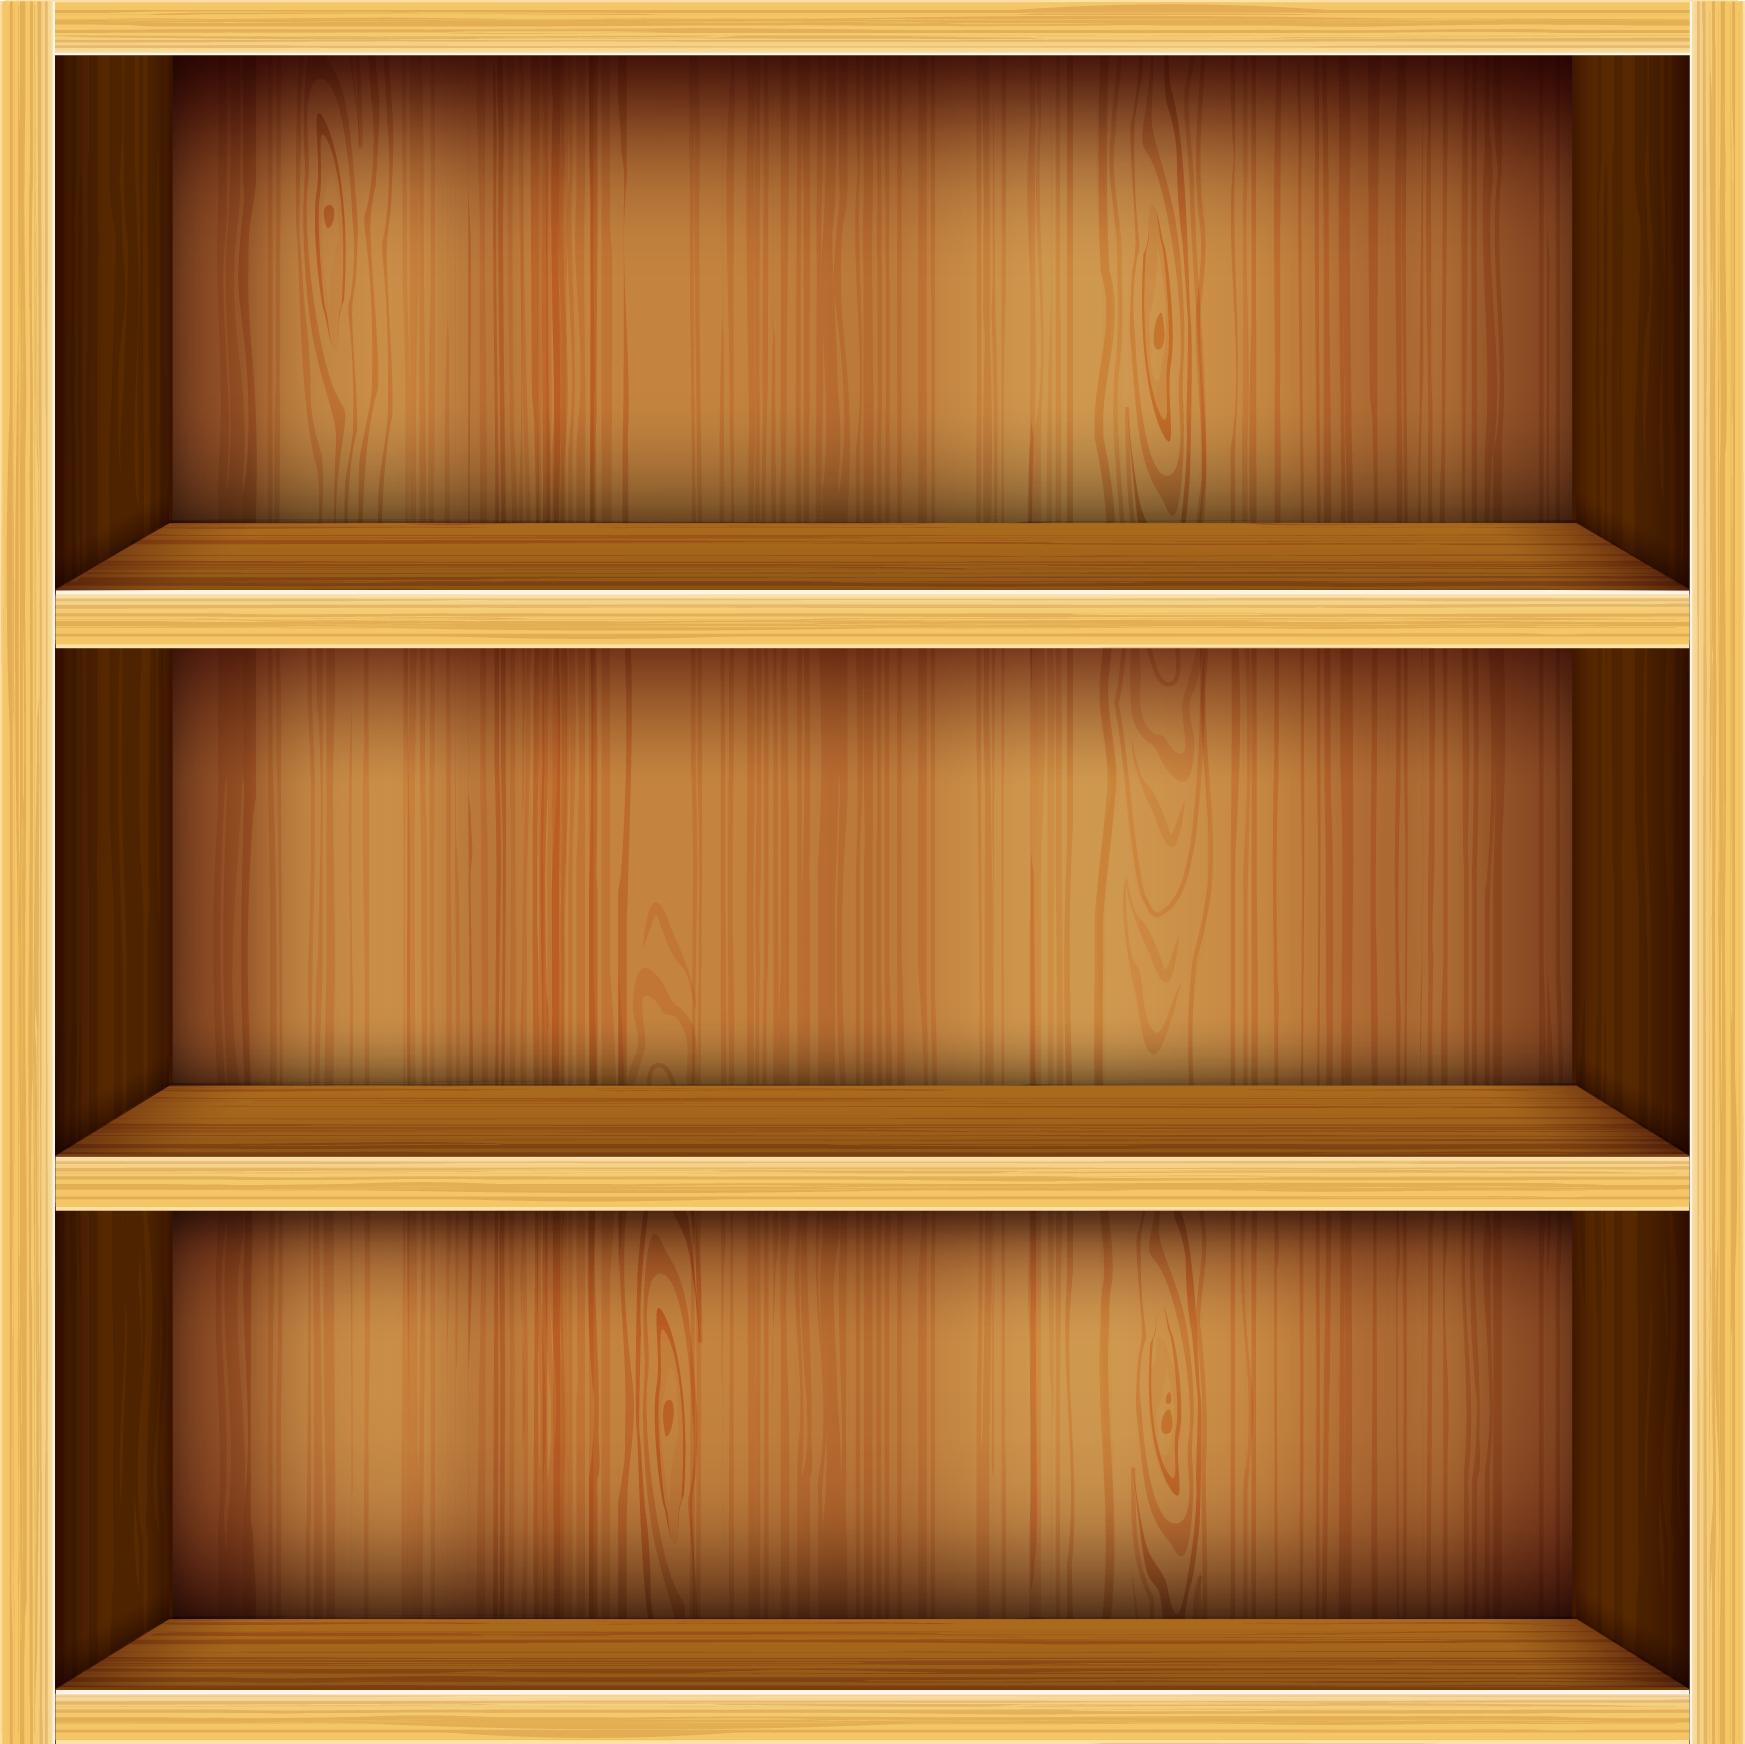 Bs Png Izobrazhenie Png 1745 1744 Piksela Mashabirano 50 Bookcase Shelves Solid Wood Bookshelf